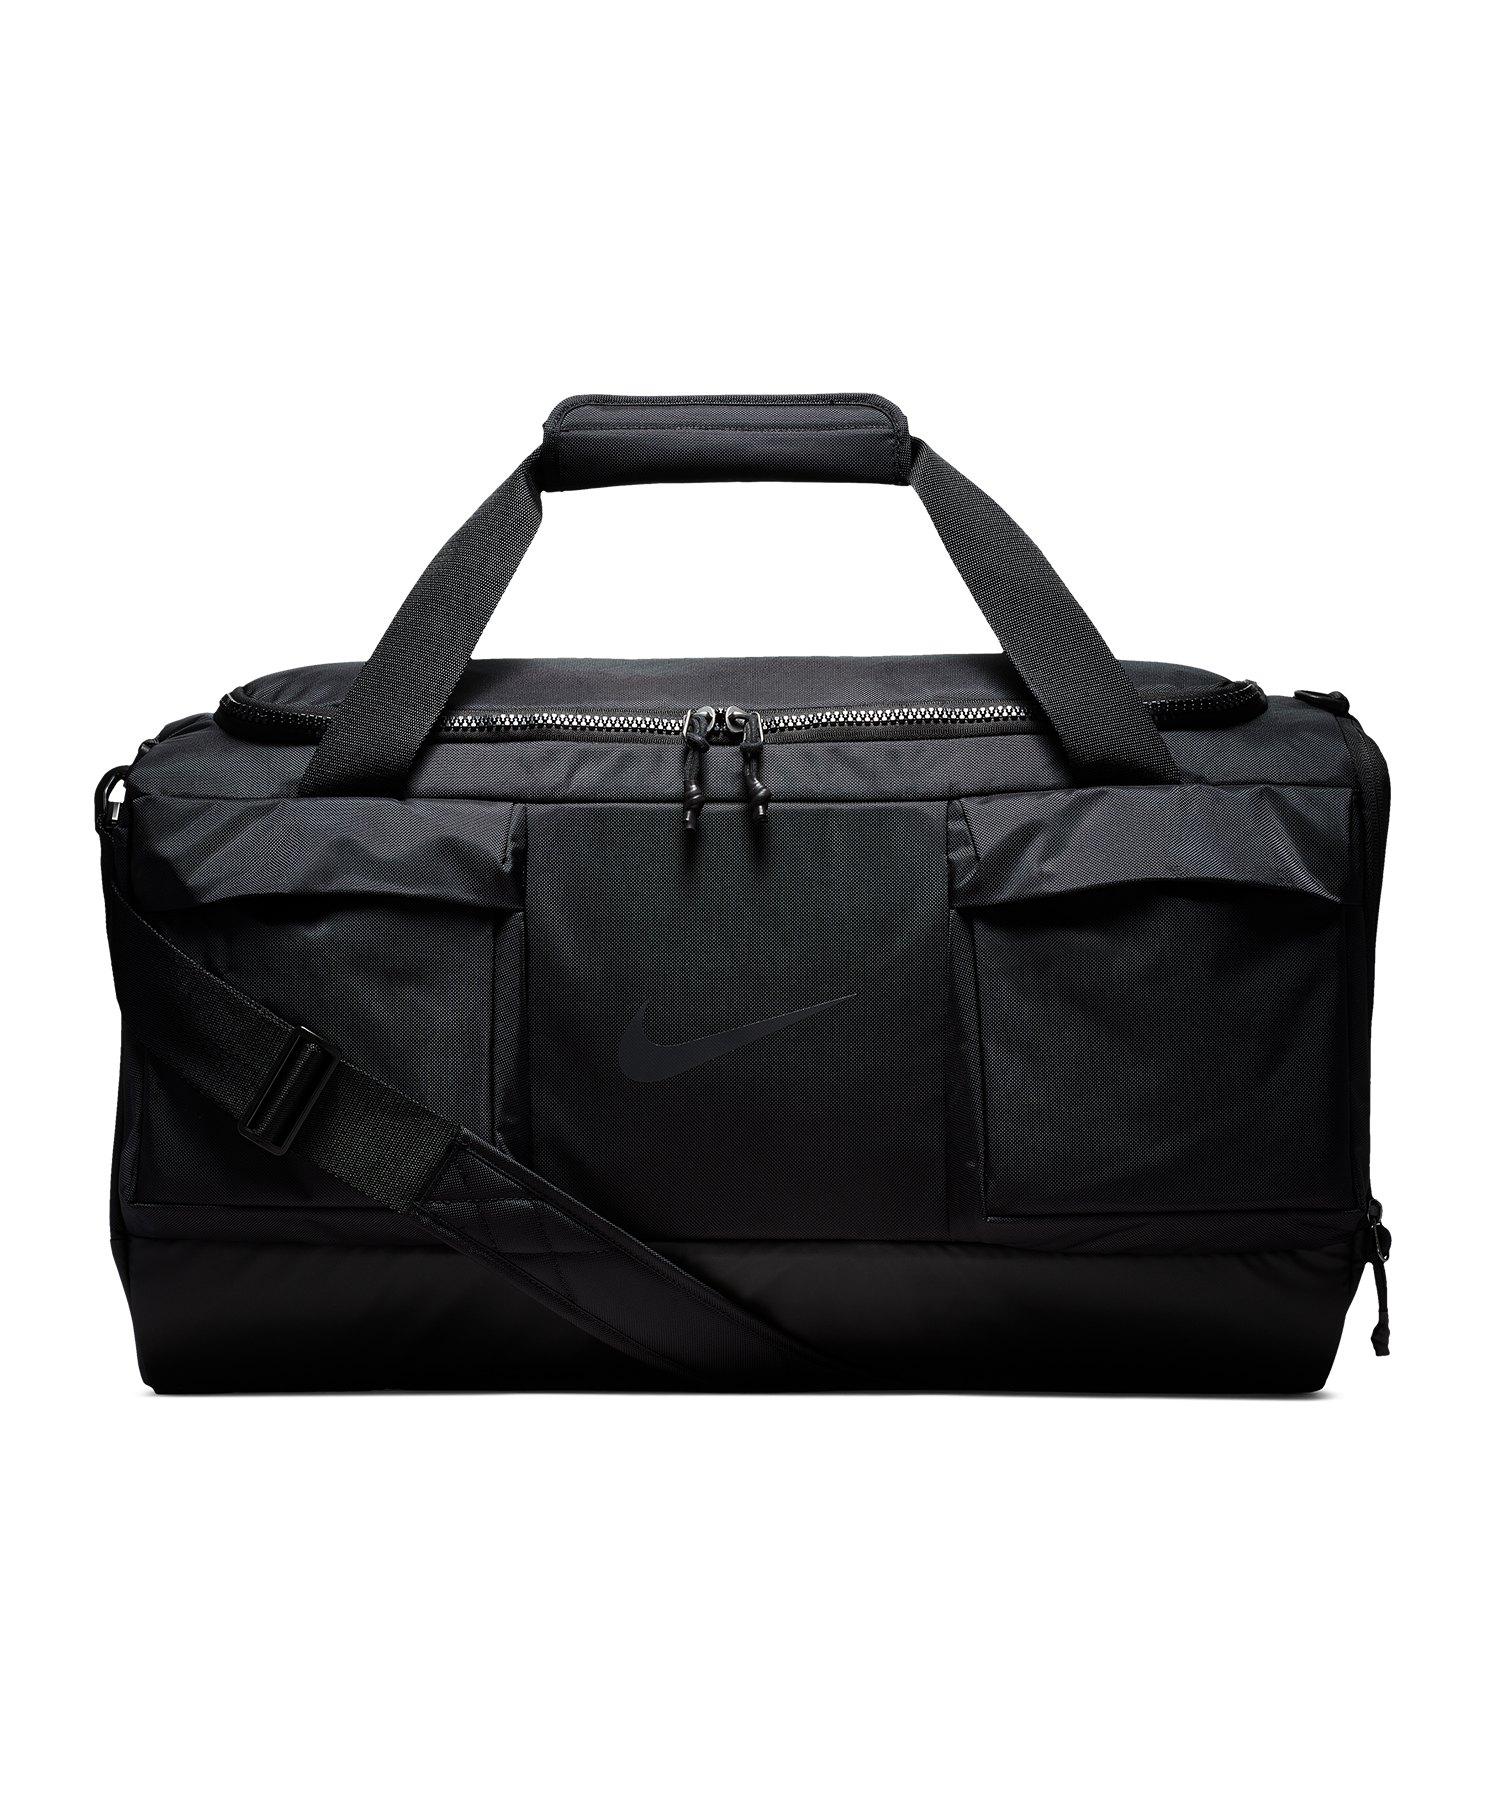 Nike Vapor Power Duffel Tasche Medium Schwarz F010 - schwarz